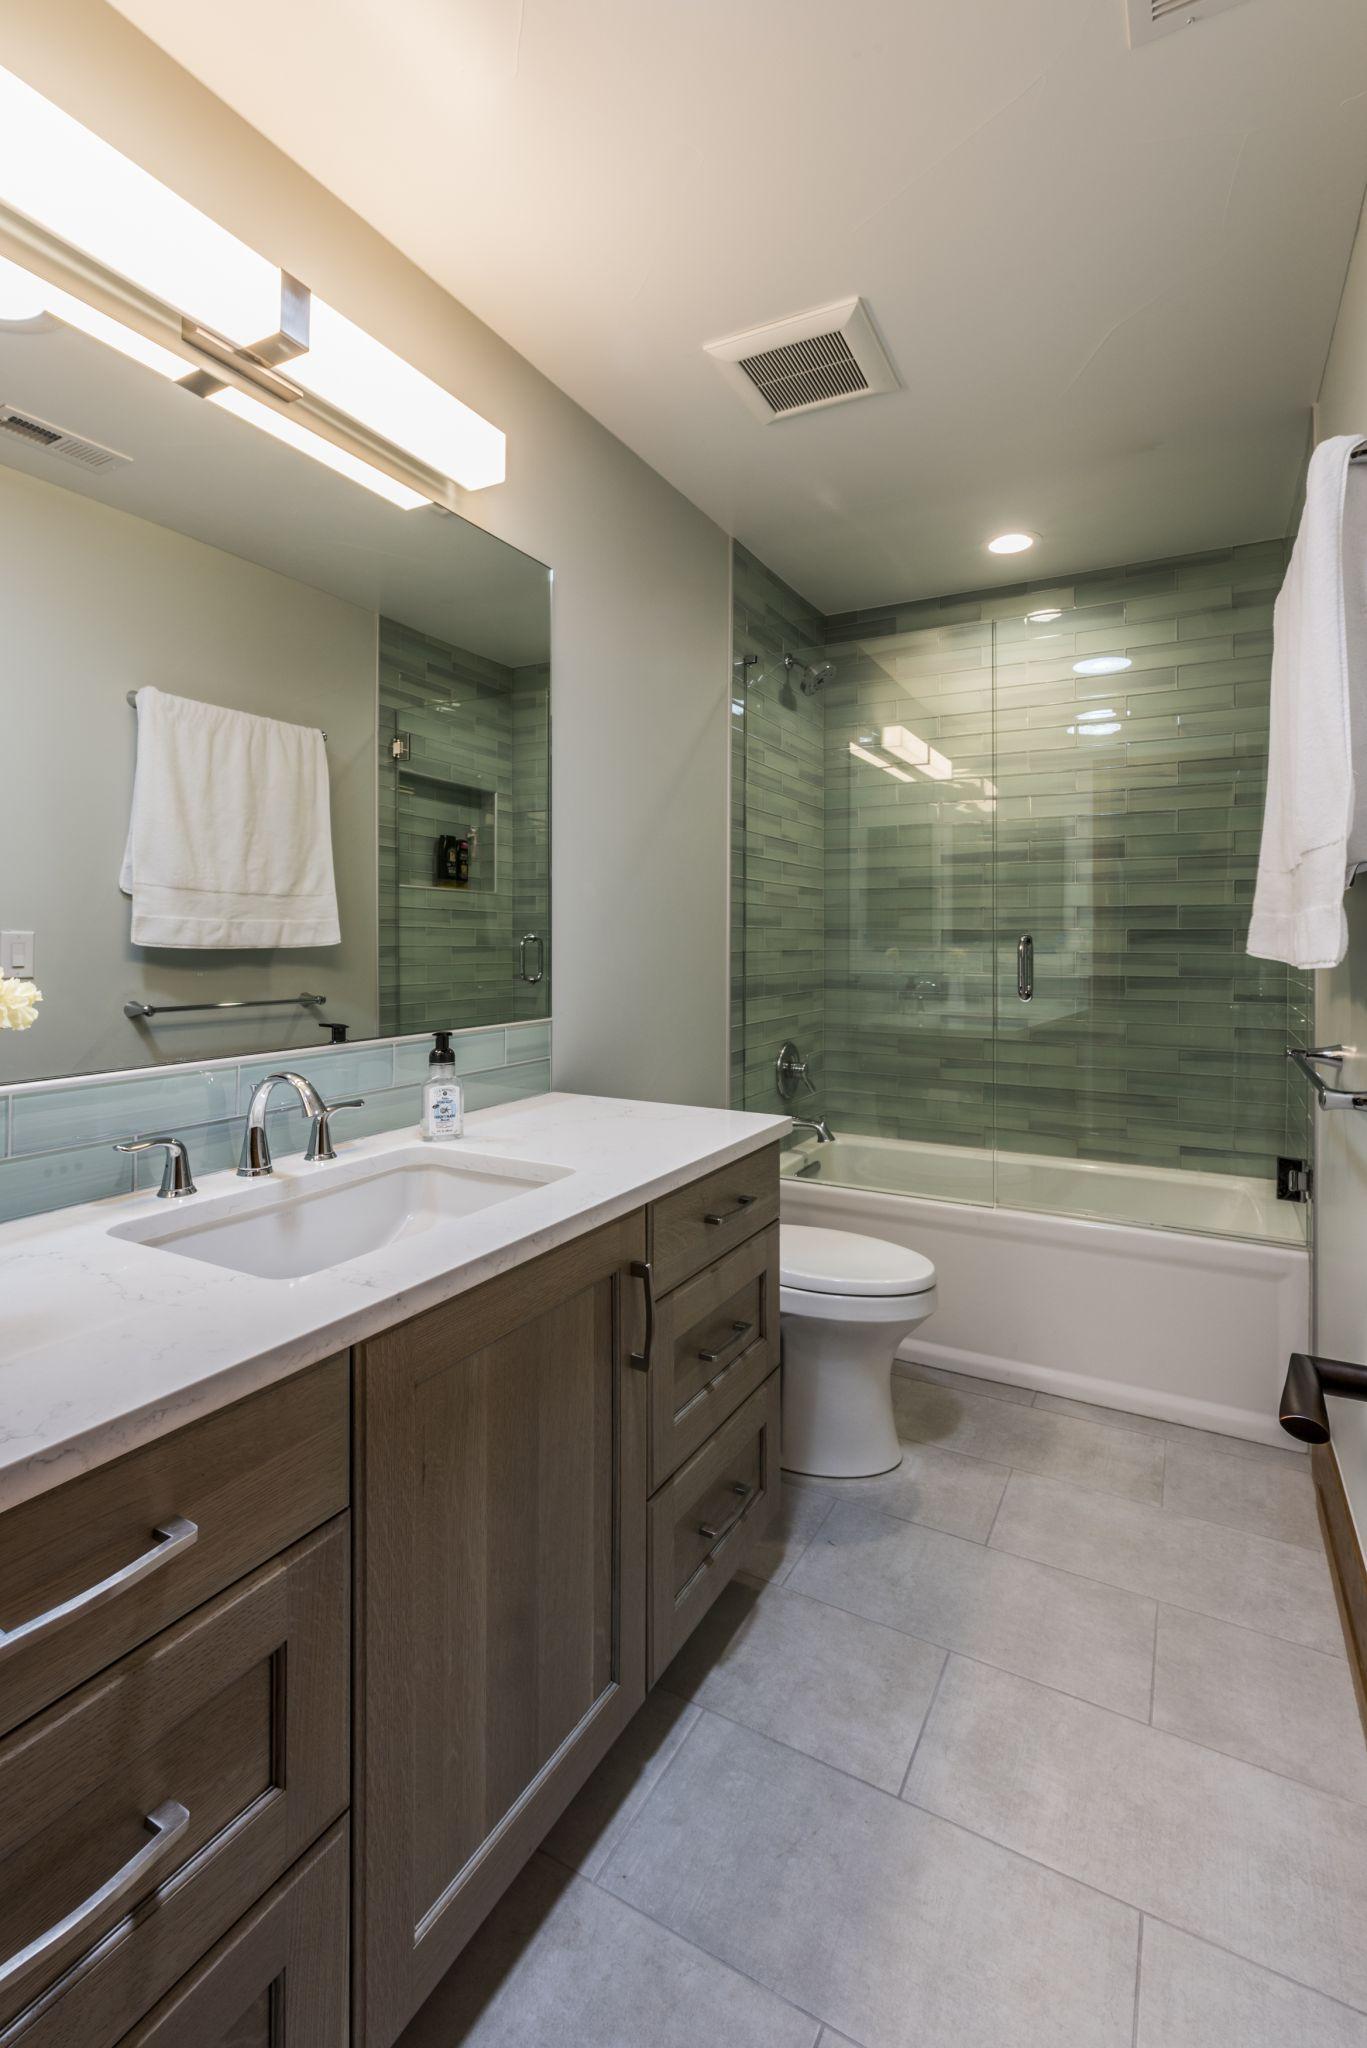 Baths Bkc Kitchen And Bath Crystal Cabinets Bathroom Cabinetry Kitchen And Bath Crystal Bath